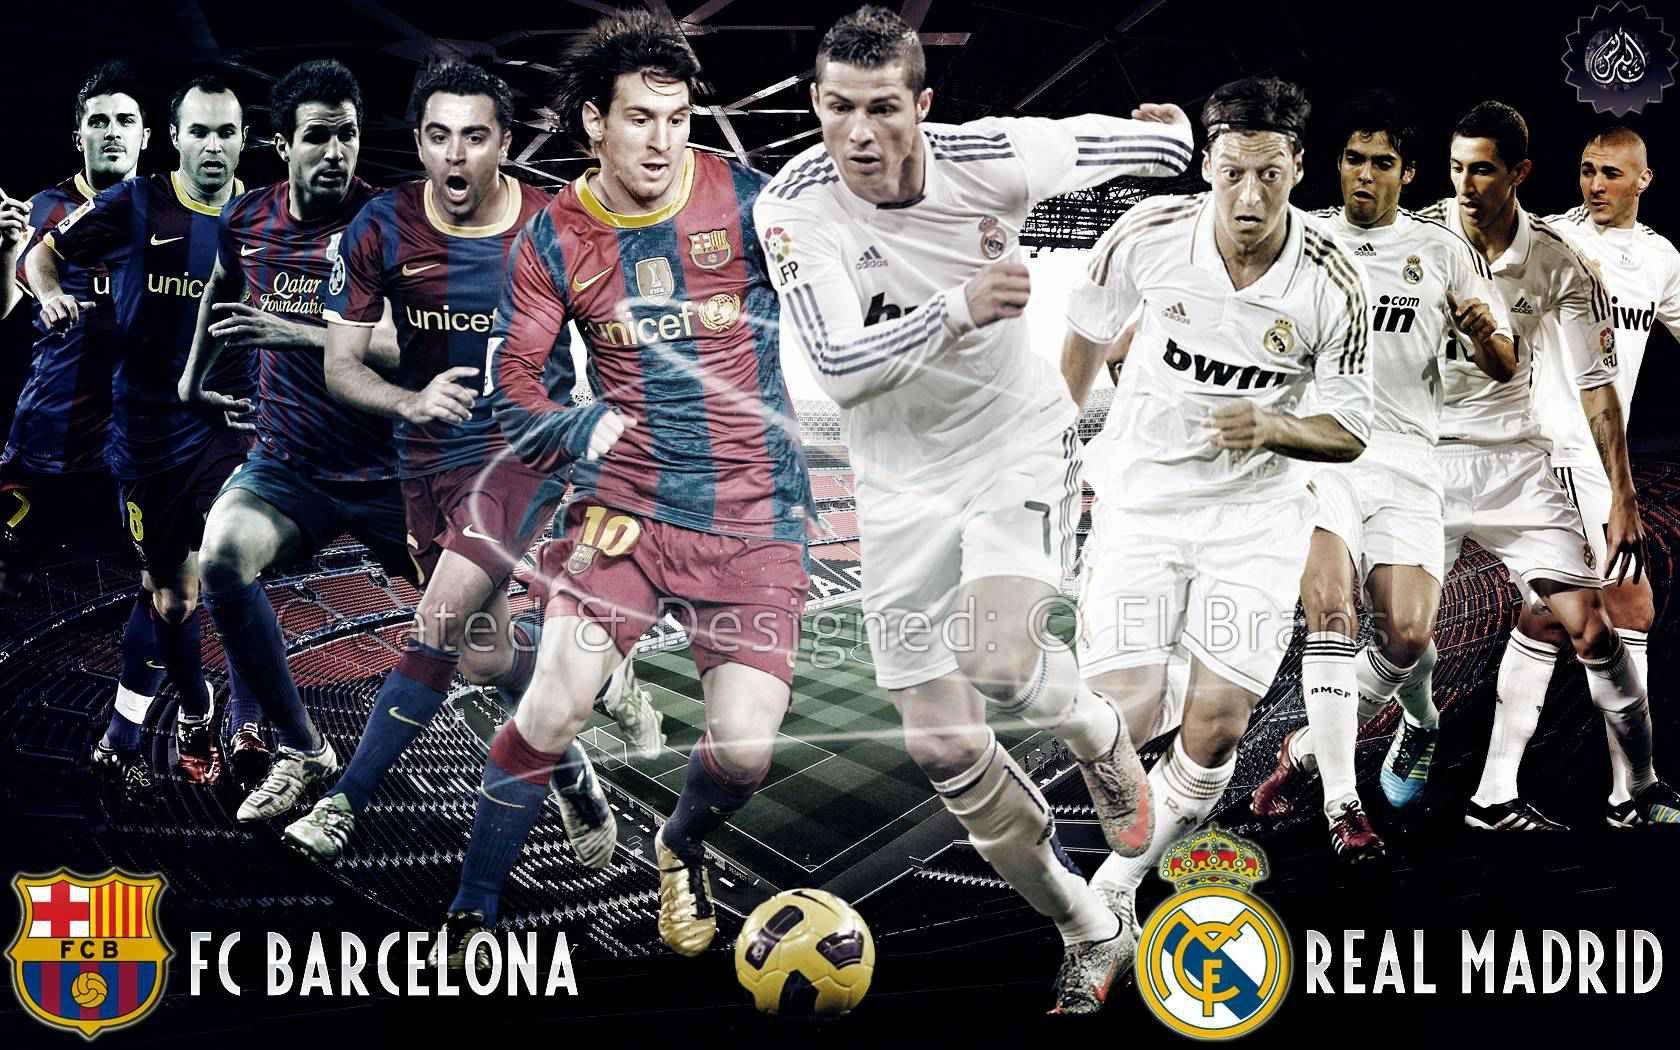 Real Madrid Wallpapers Full Hd Wallpaper Wallpapers For Desktop